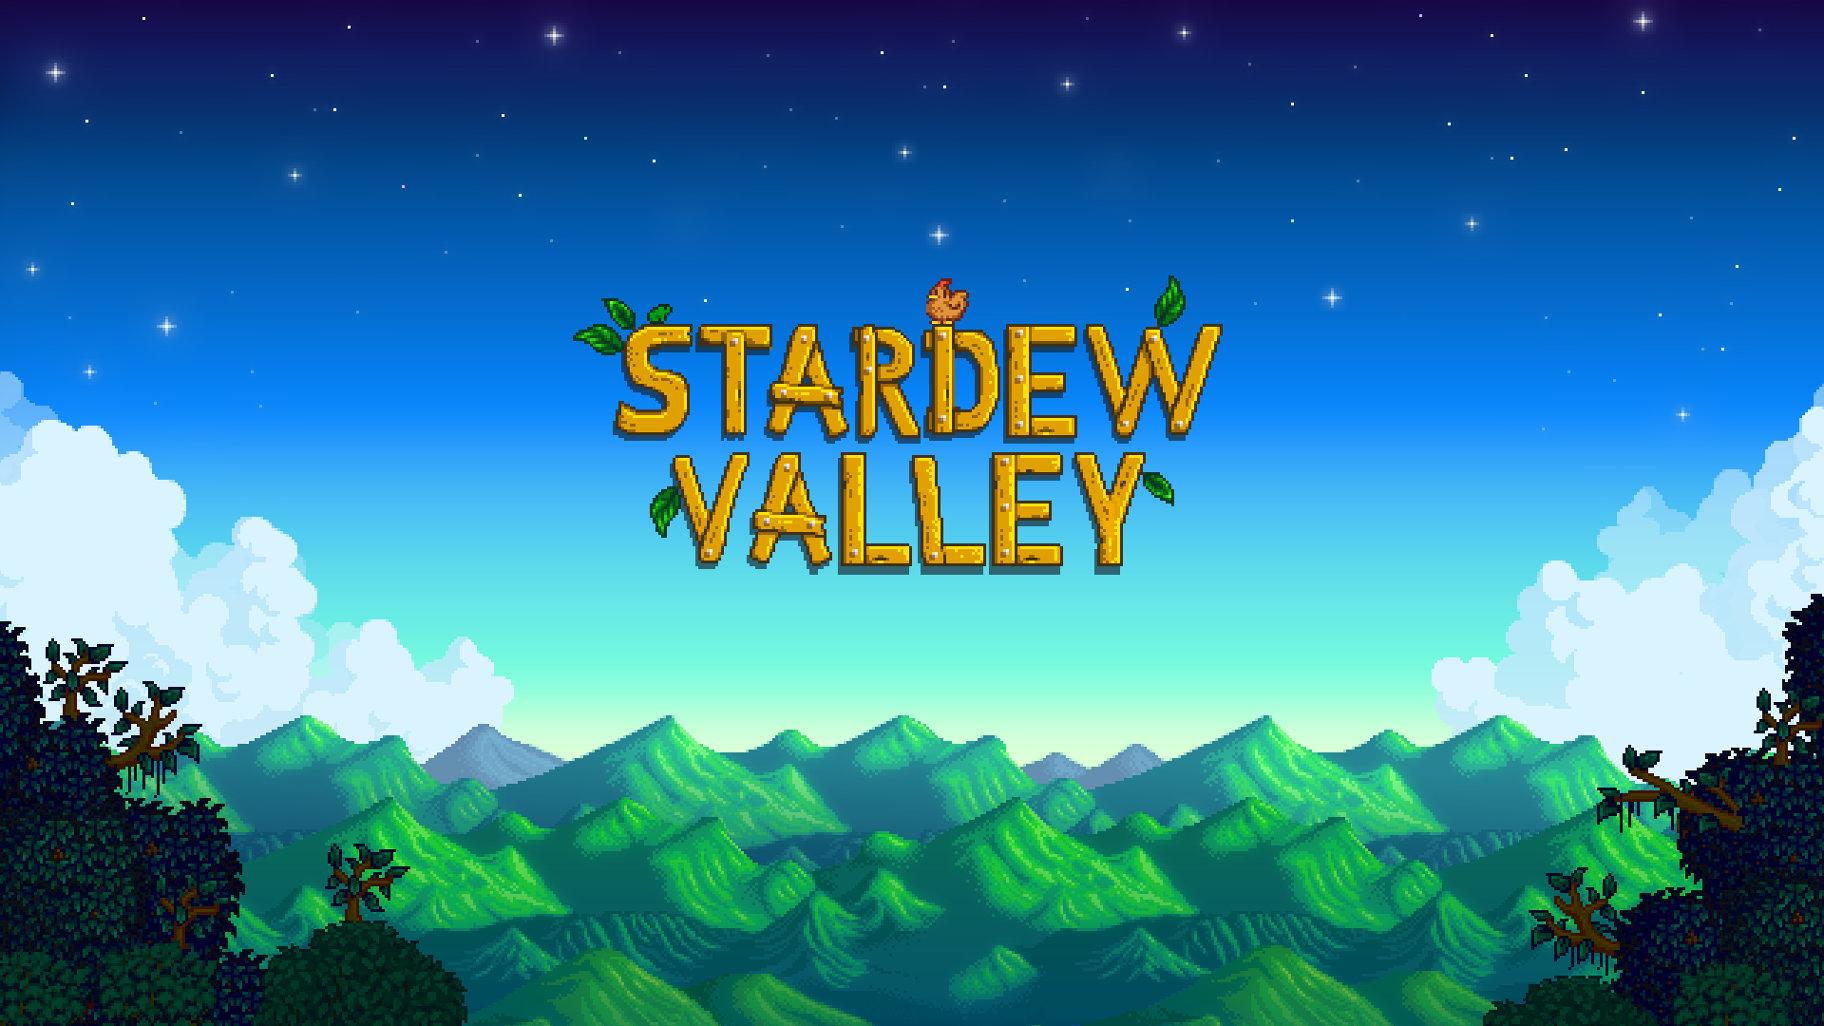 stardew-valley-screenshot-logo